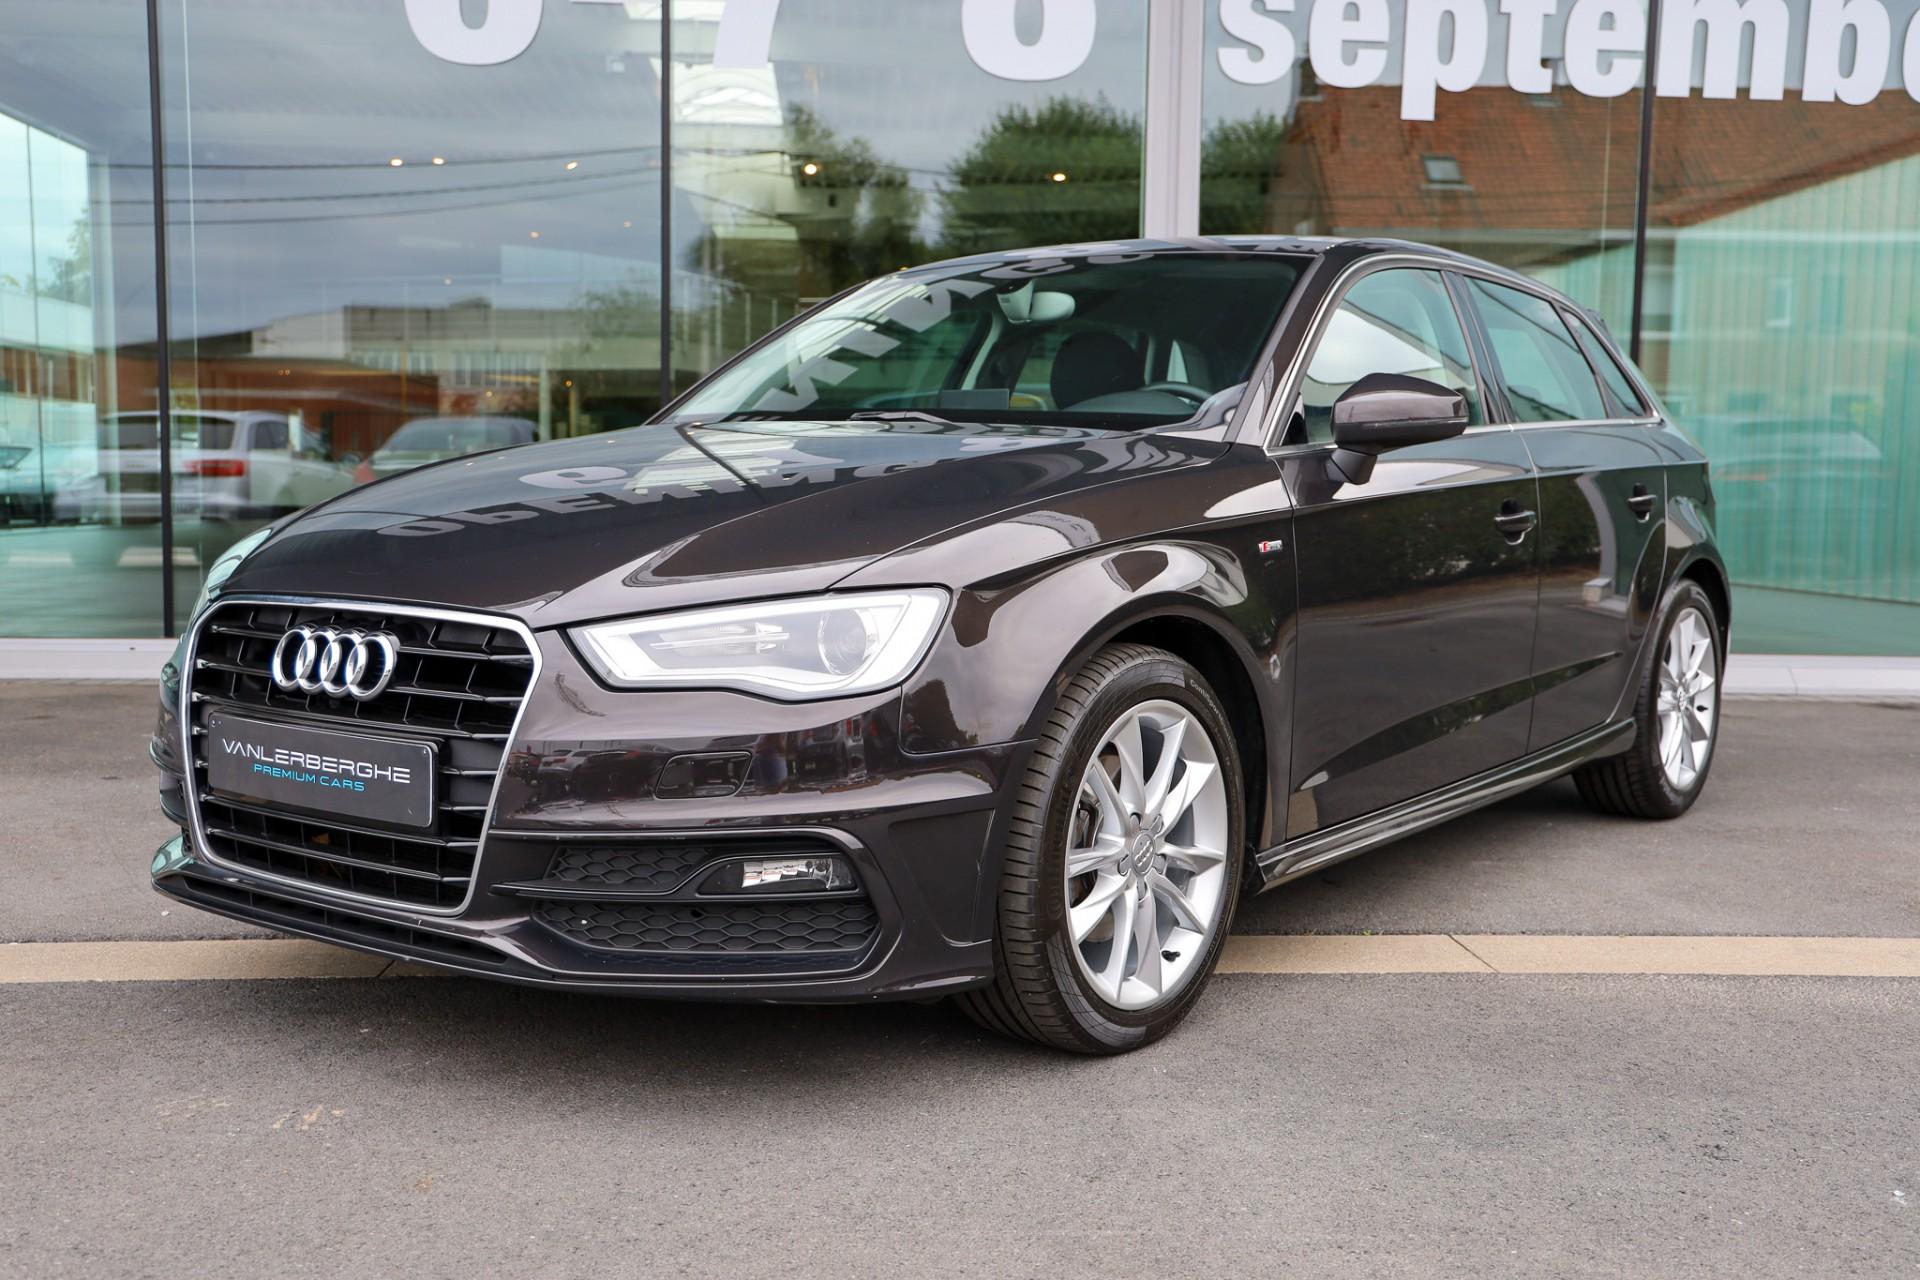 Audi A8 S-line - Audi - Vanlerberghe Premium Cars, used cars ...   used cars audi a3